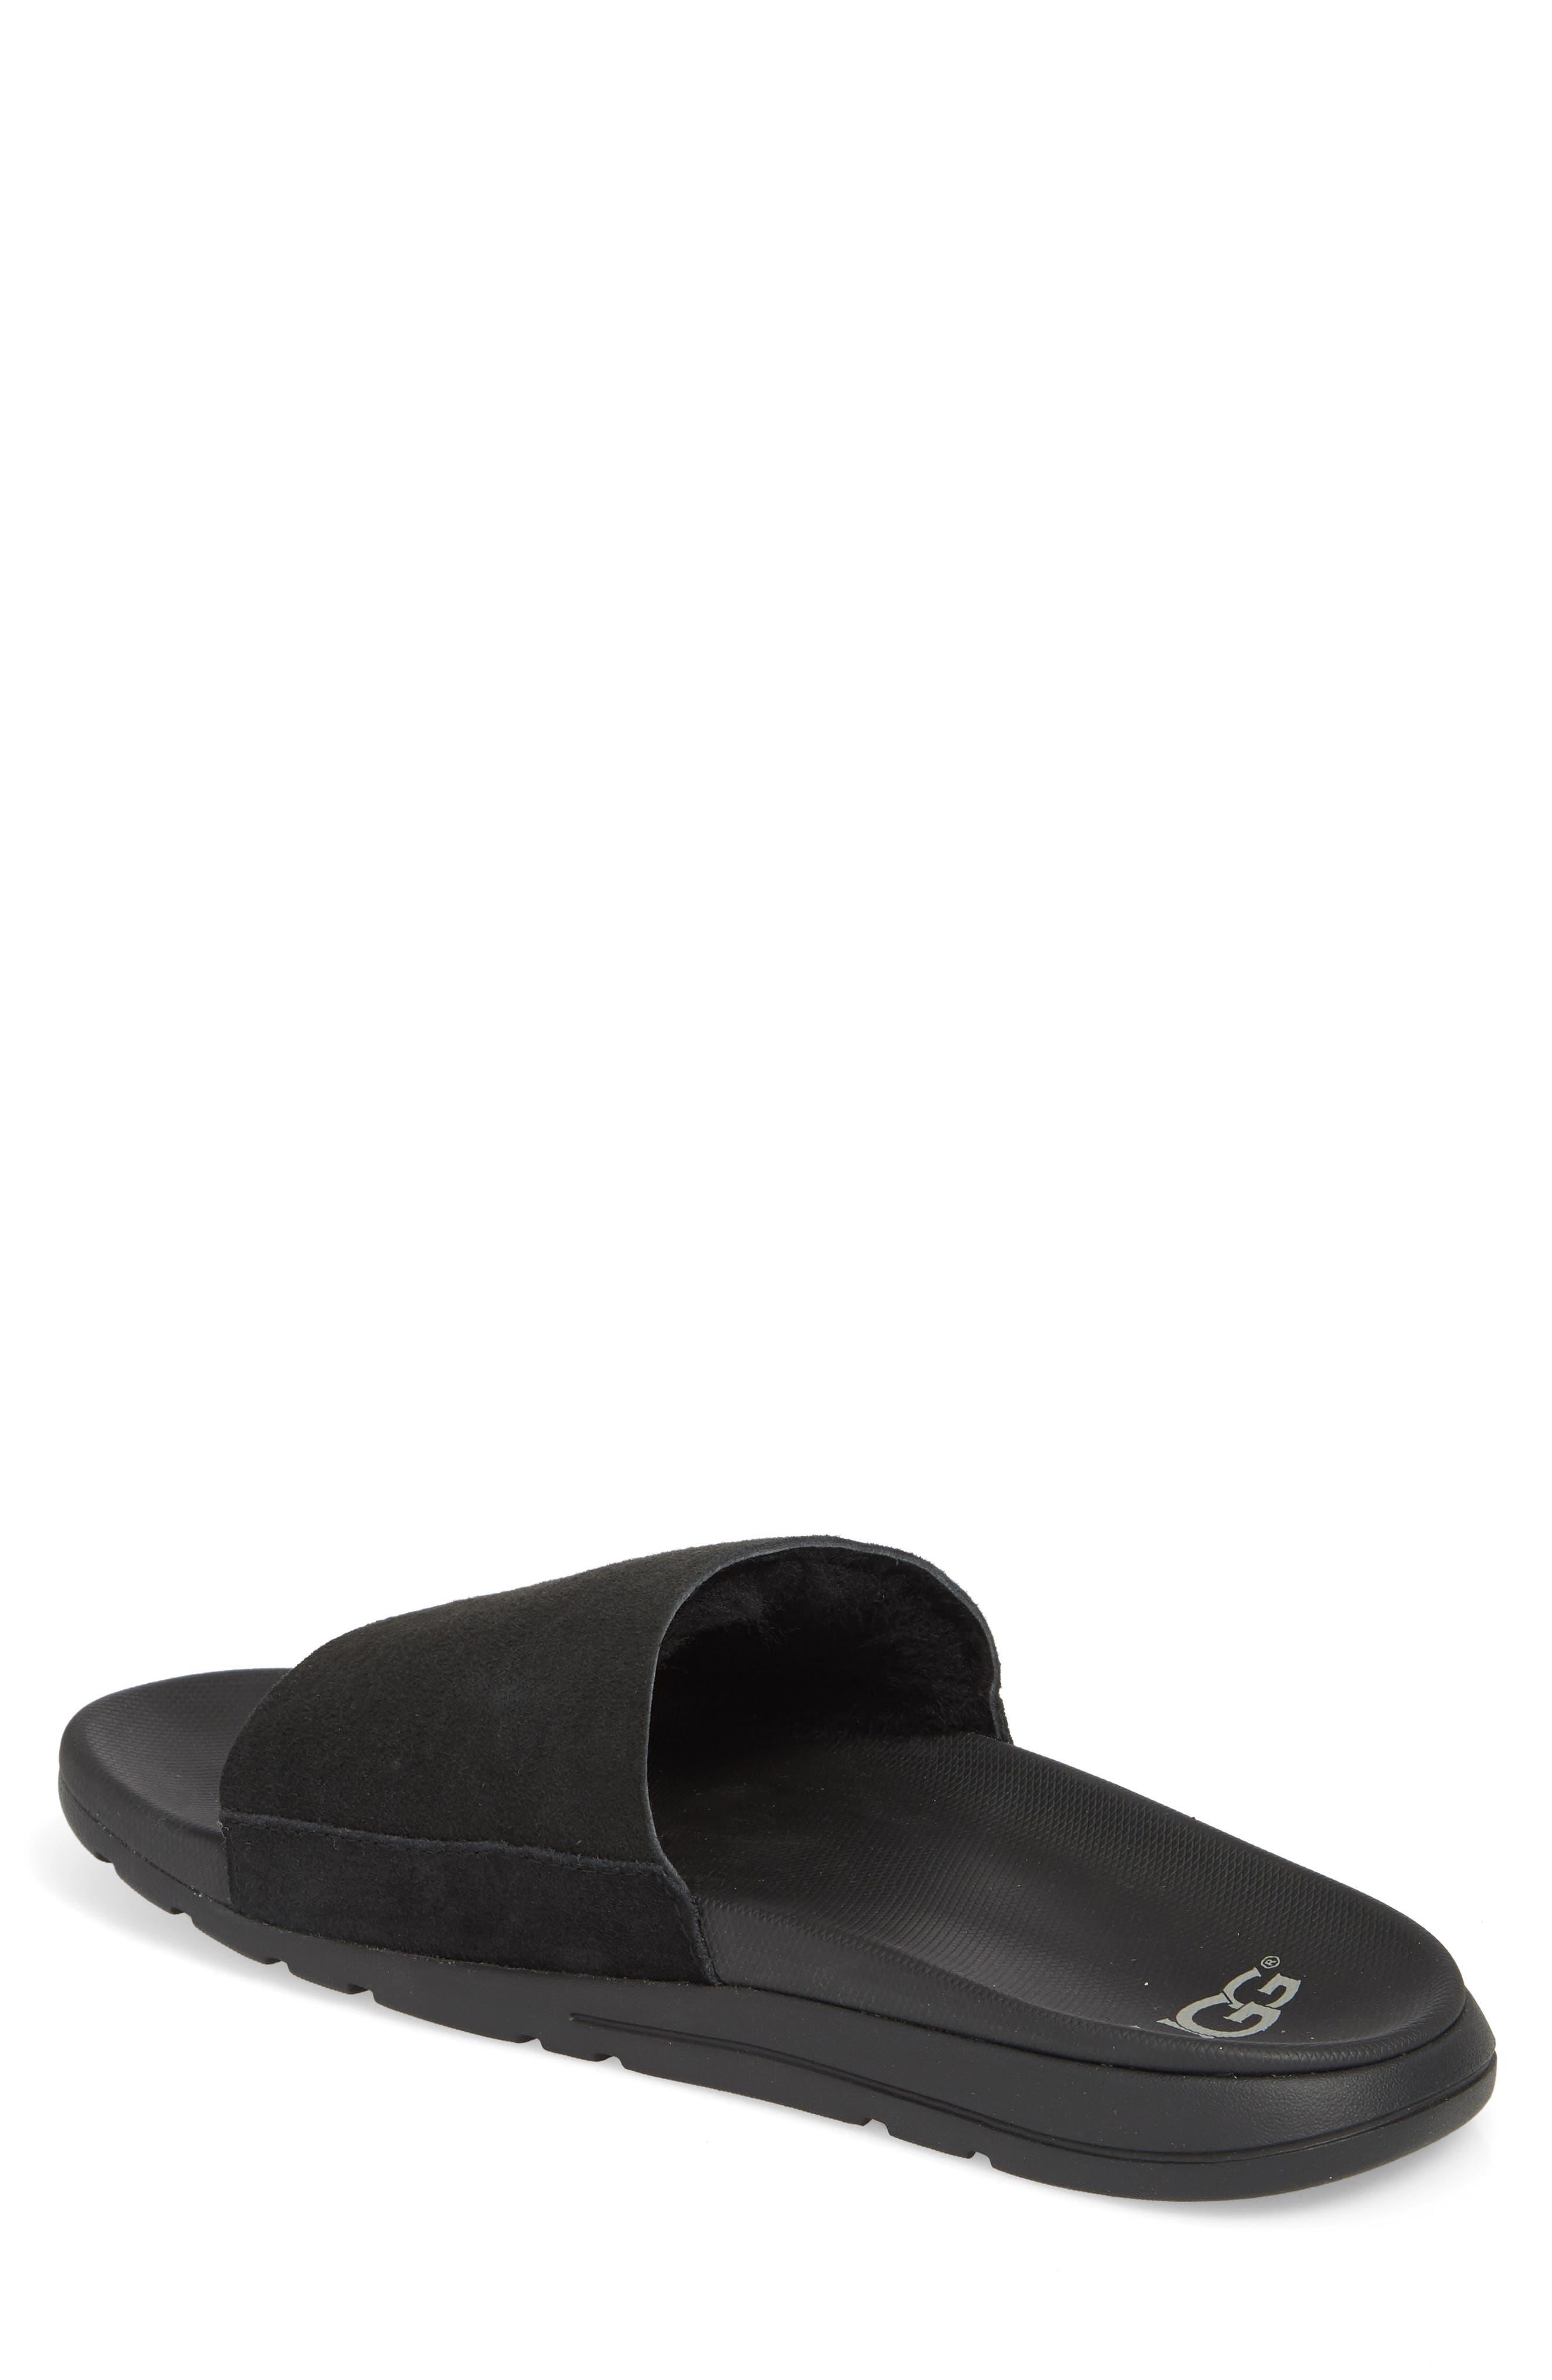 063d1743d36 ugg sandals